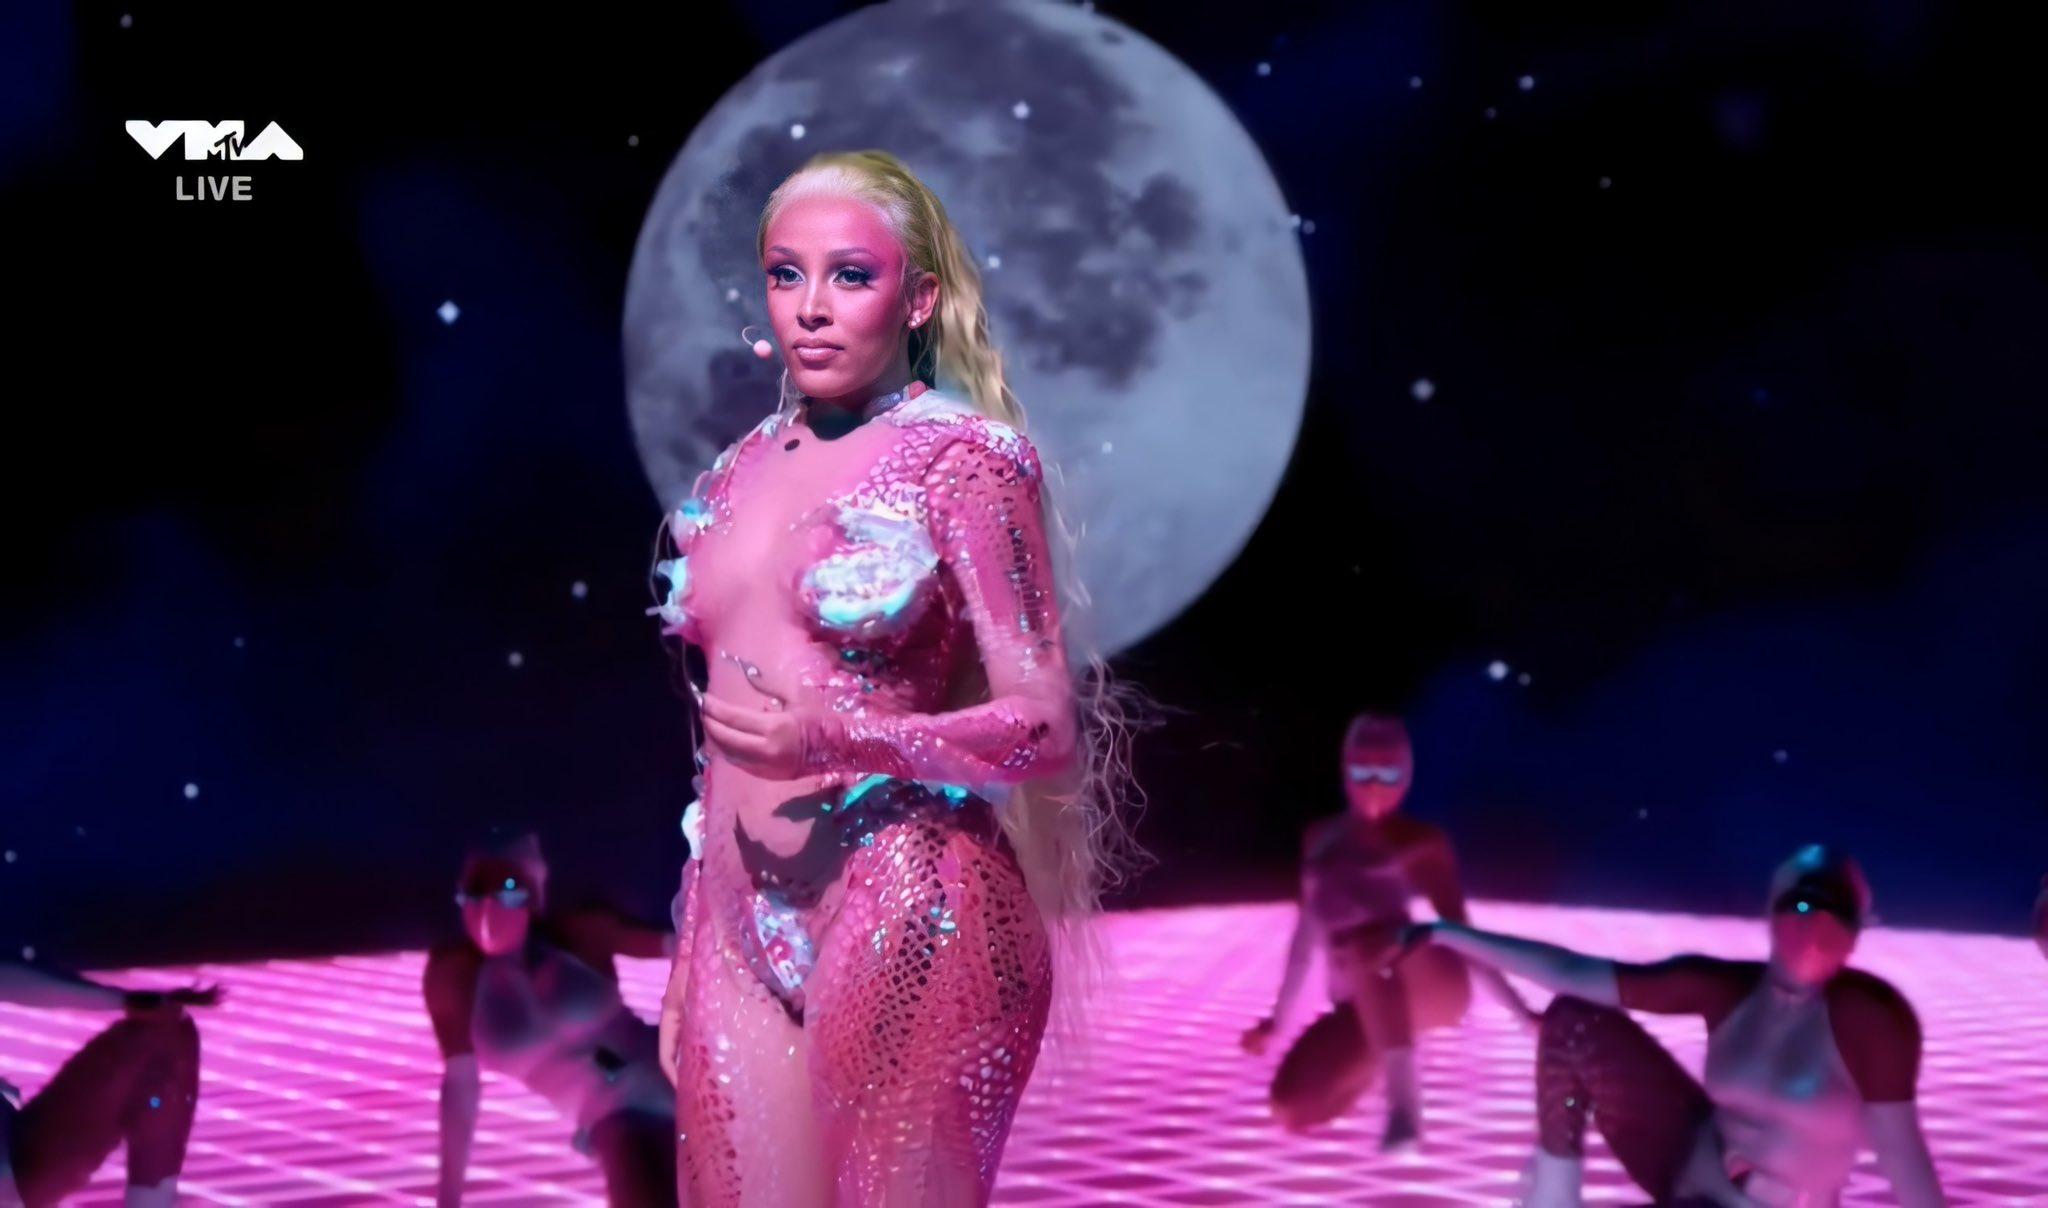 Doja Cat performs at the 2020 VMAs